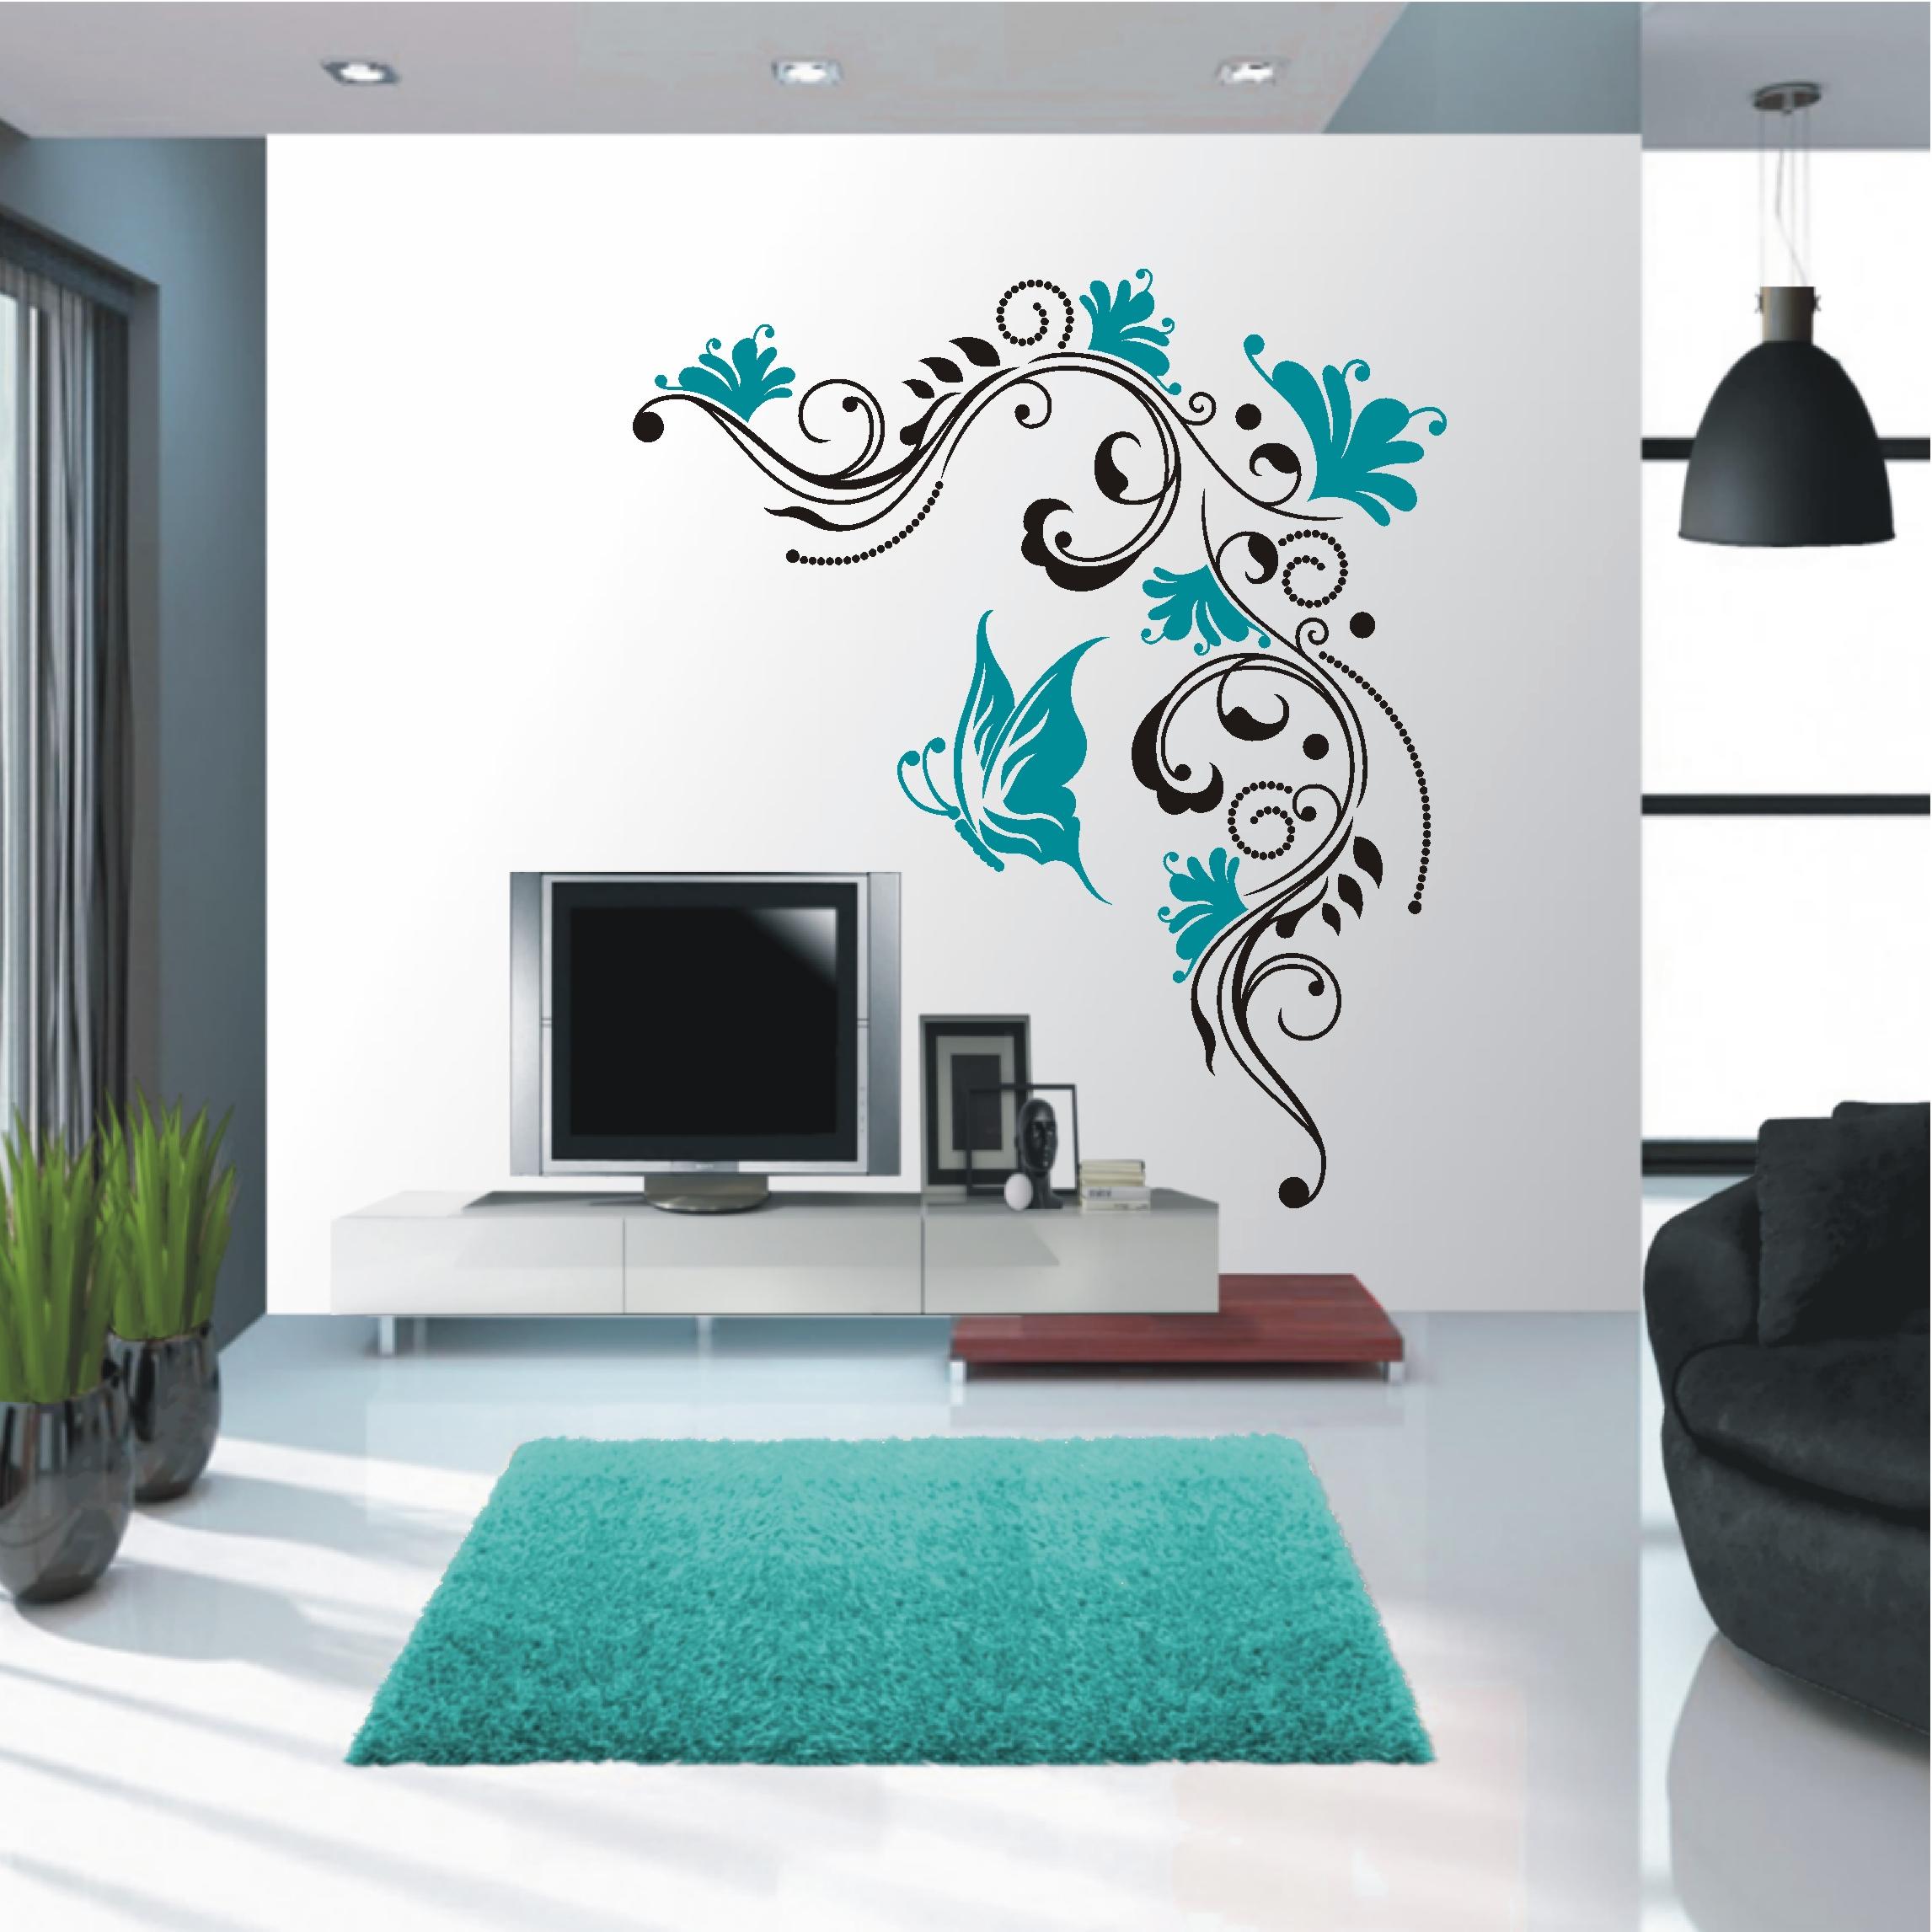 deko shop wandtattoo blumenranke 2 farbig deko. Black Bedroom Furniture Sets. Home Design Ideas